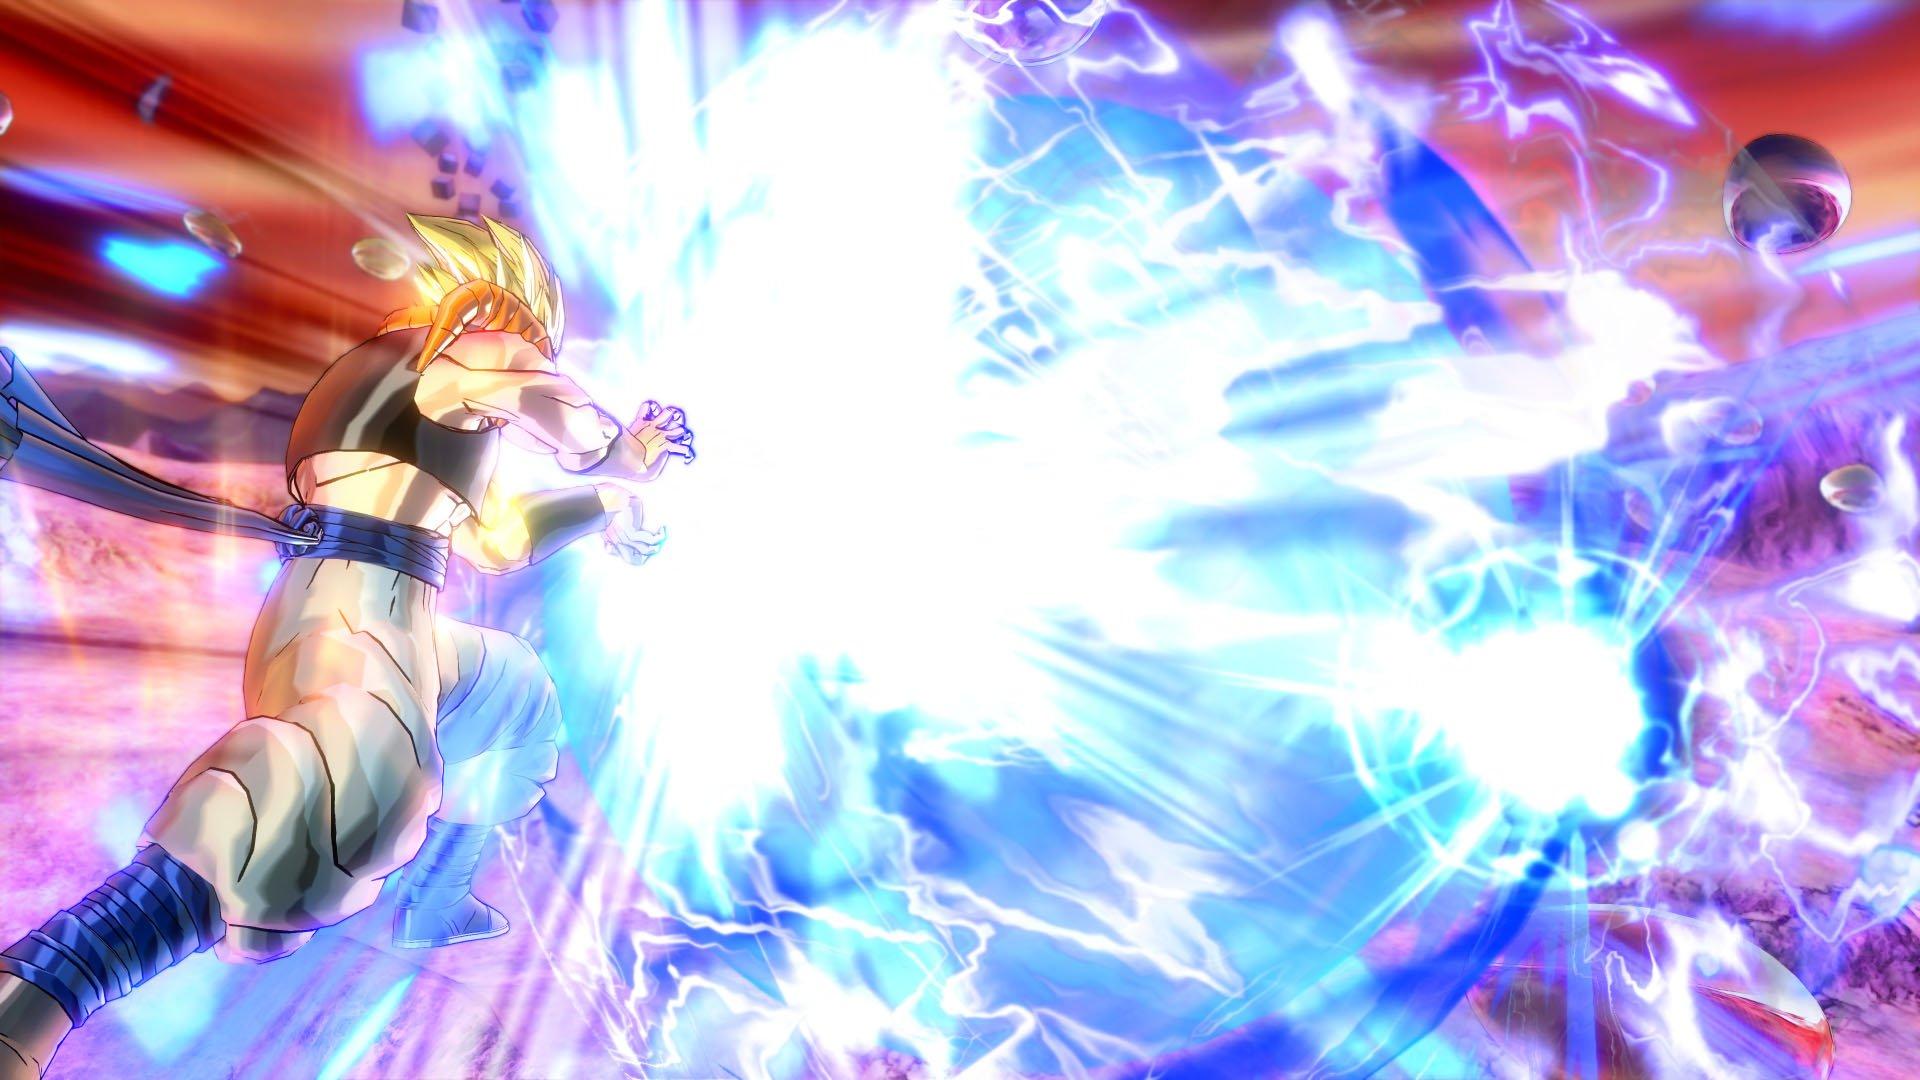 DRAGON BALL XENOVERSE 2 game image